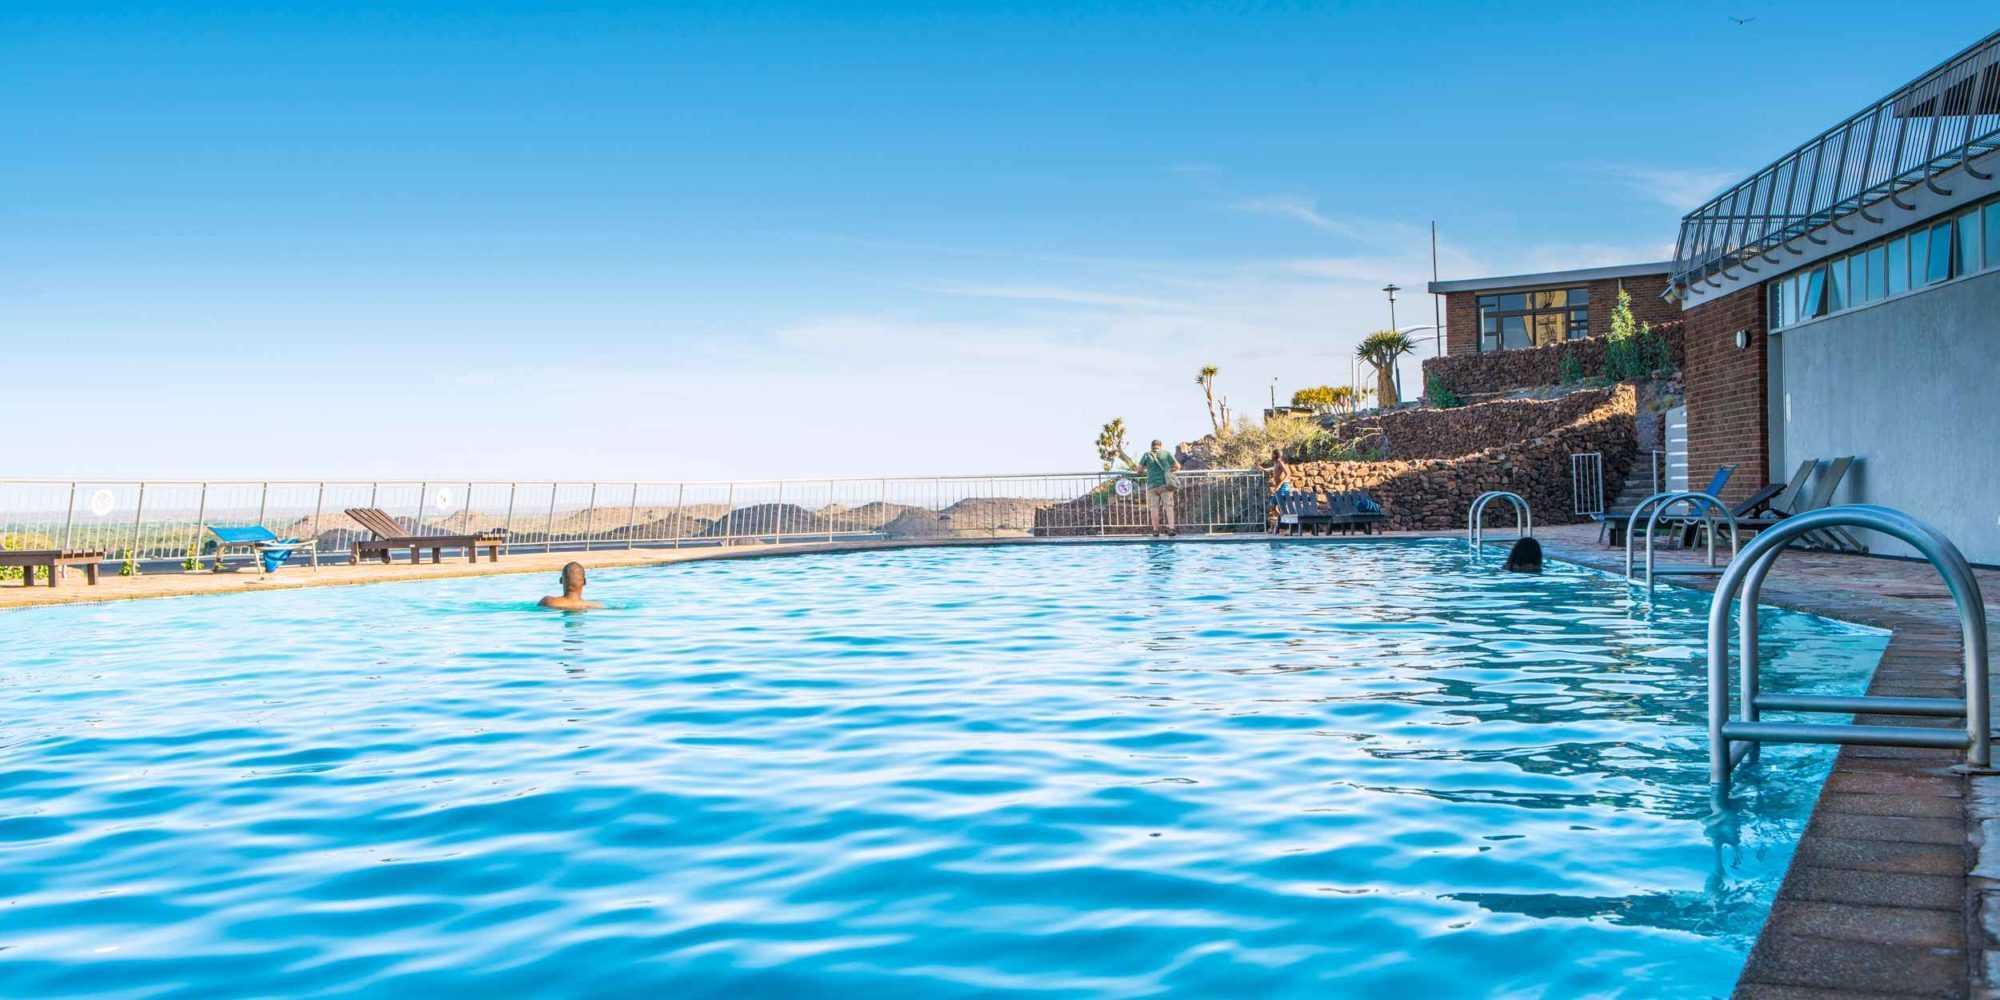 Hardap Swimming Pool 02 © NWR 2018